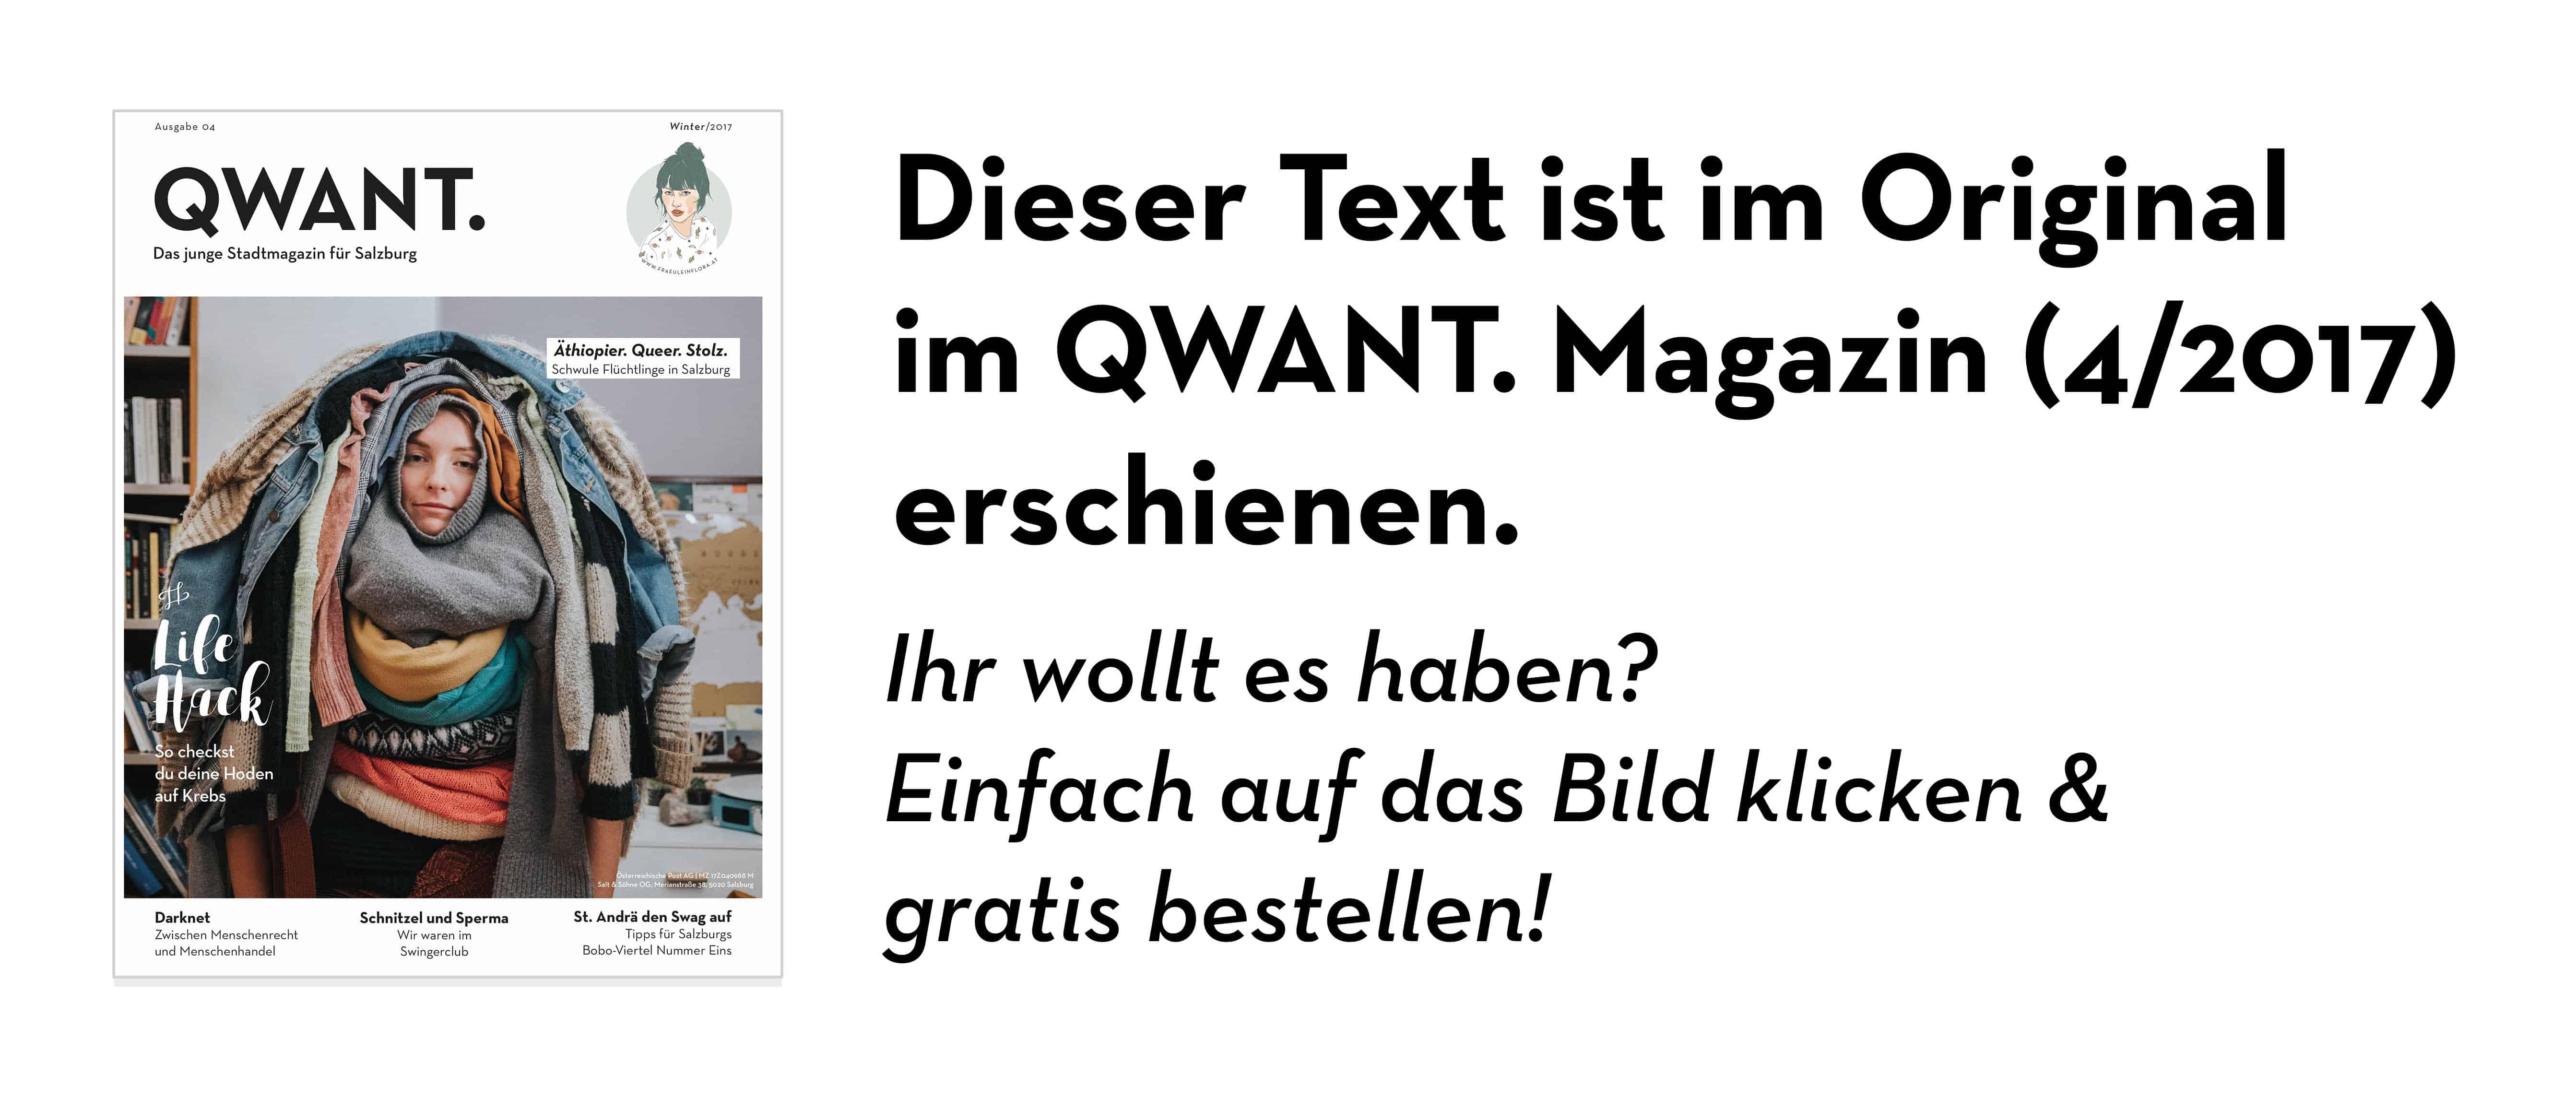 QWANT. bestellen